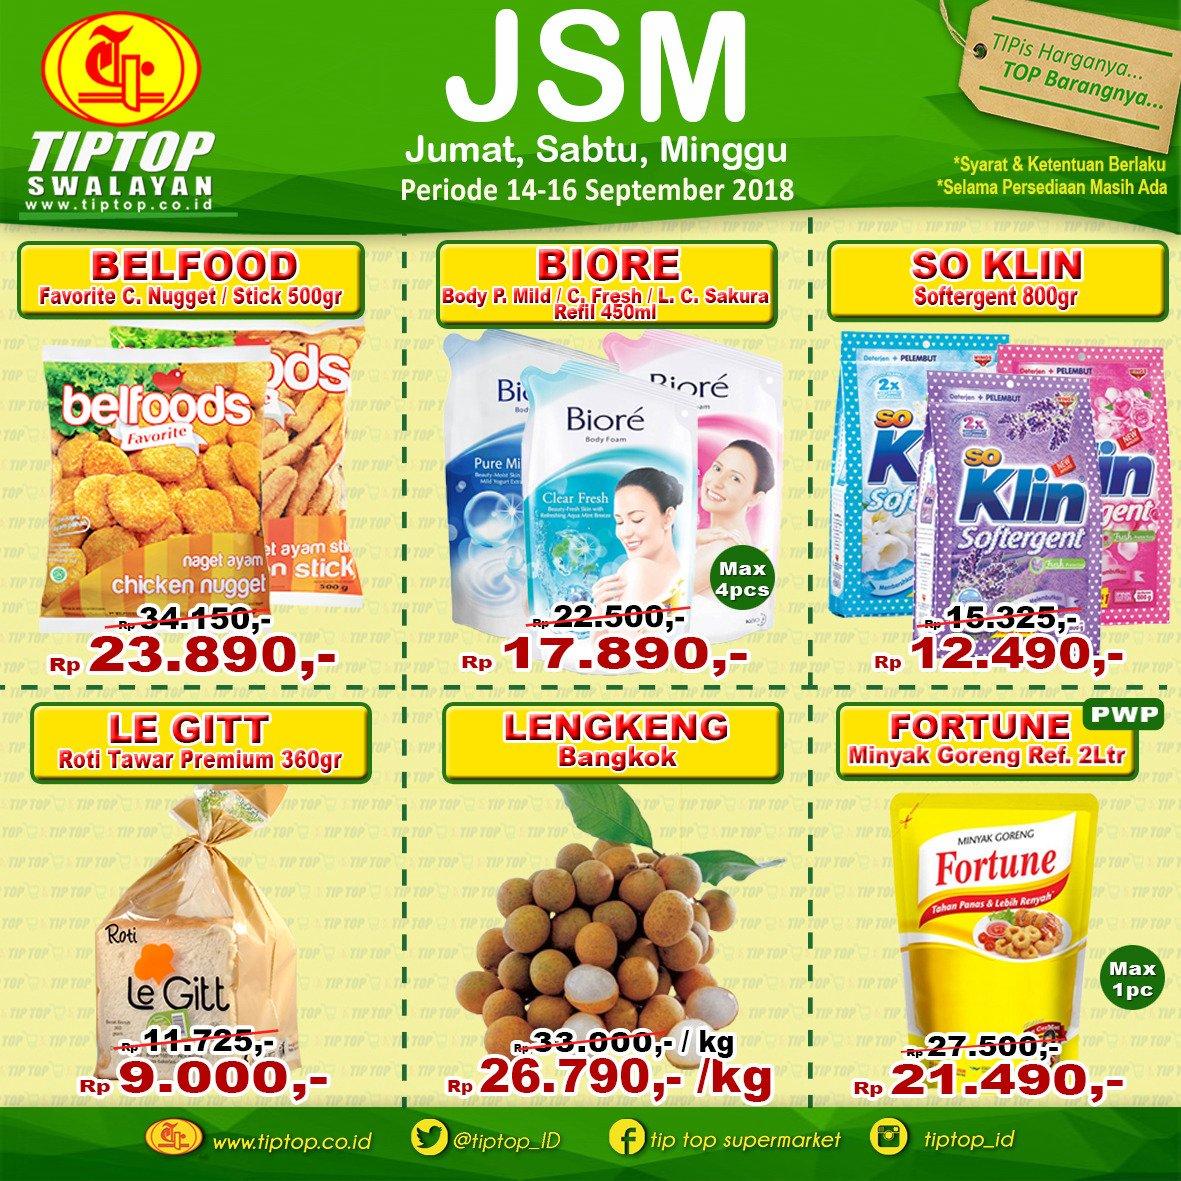 TipTop - Katalog Promo JSM Periode 14 - 16 September 2018